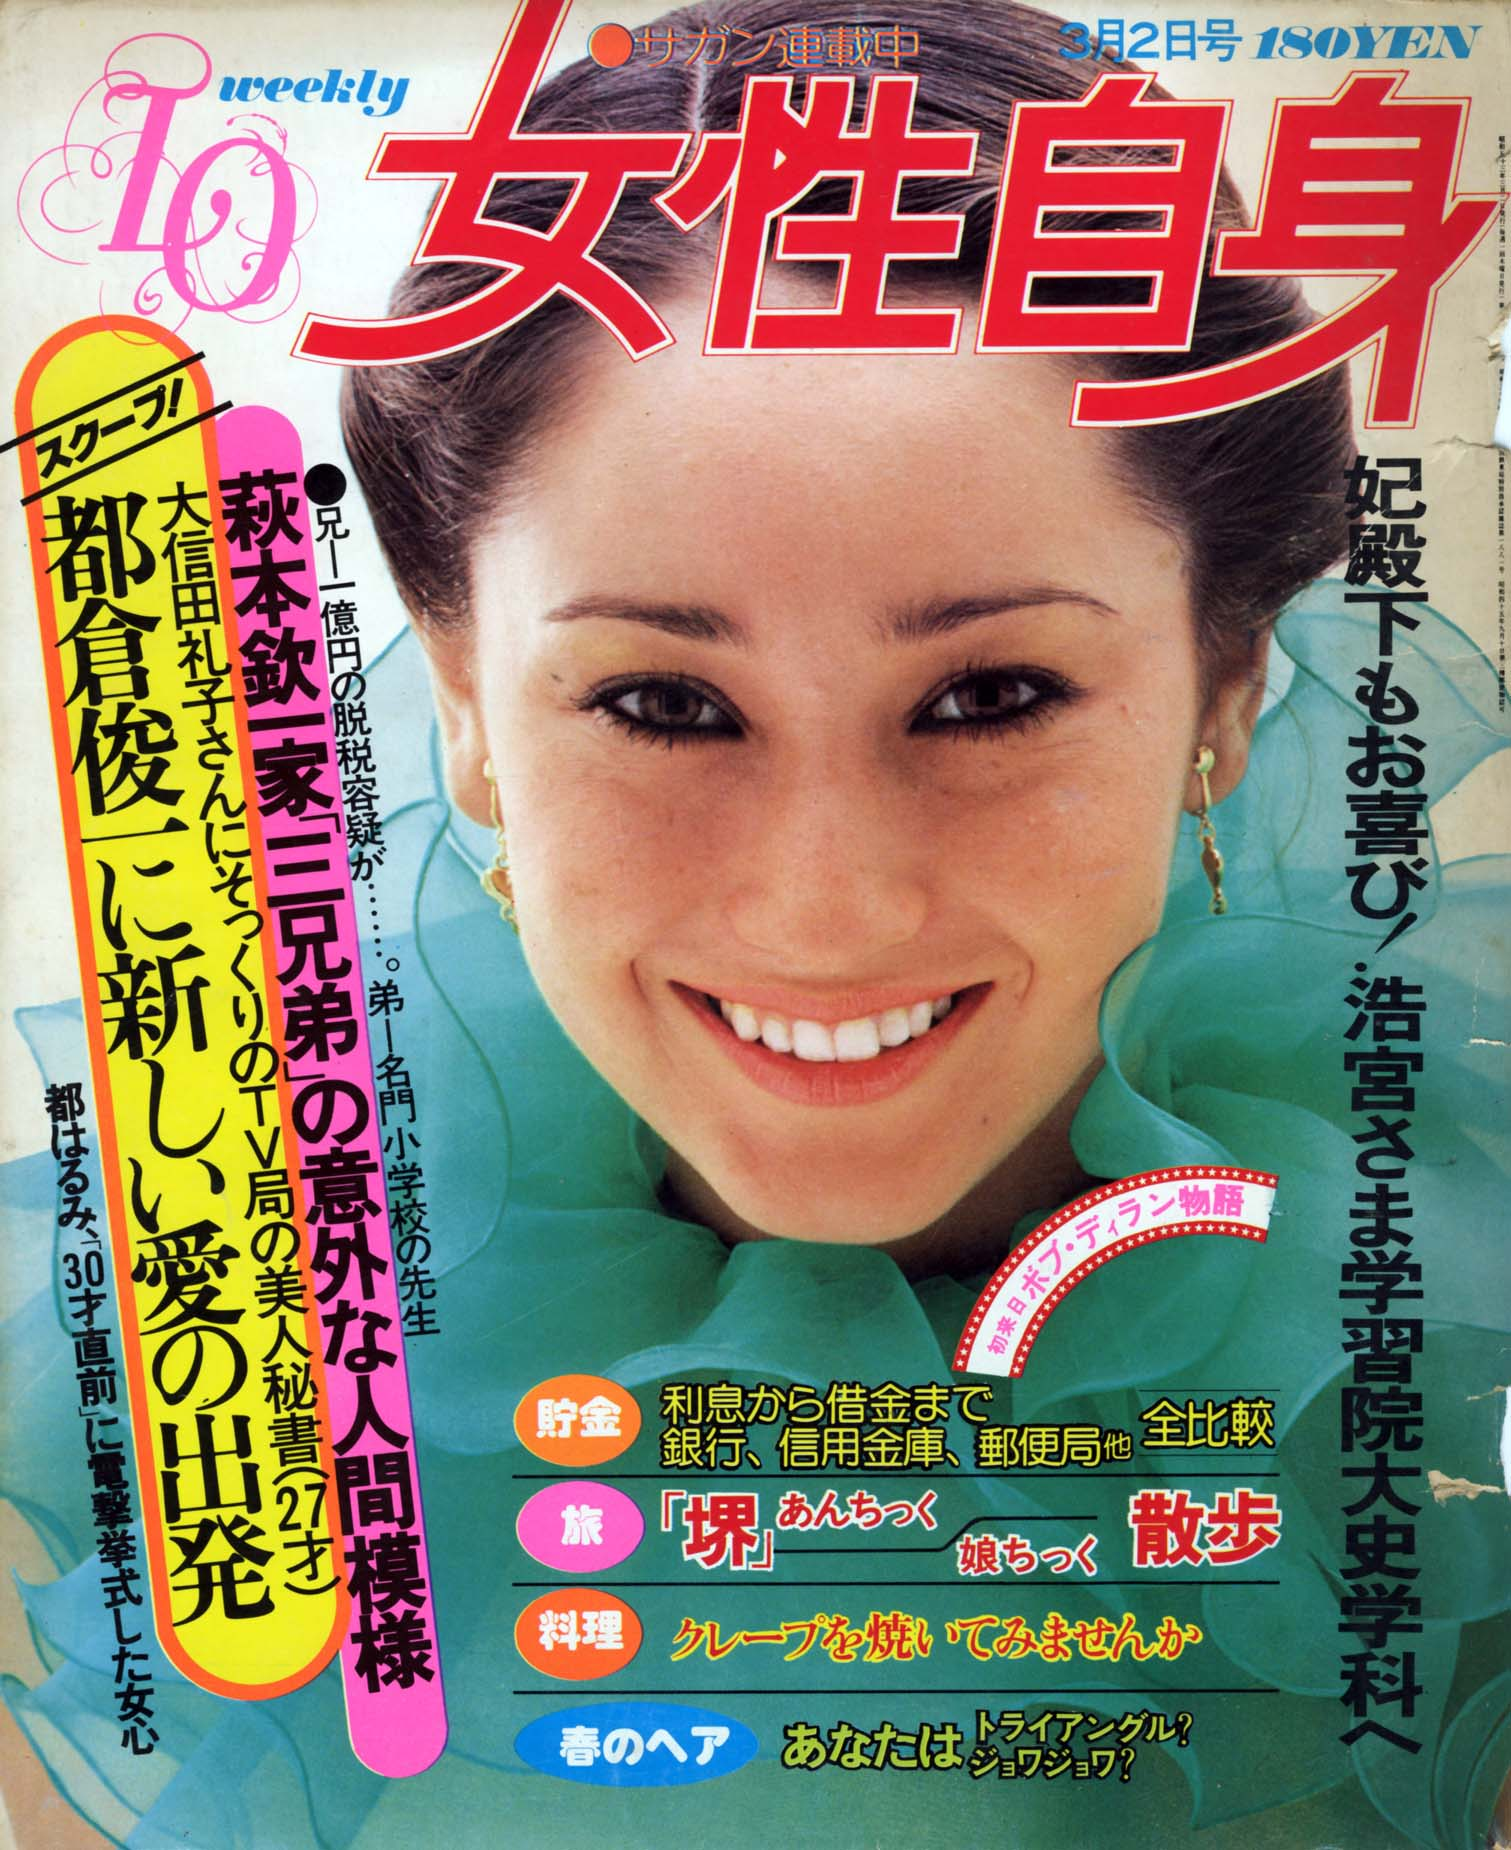 1978 Josei Jishin